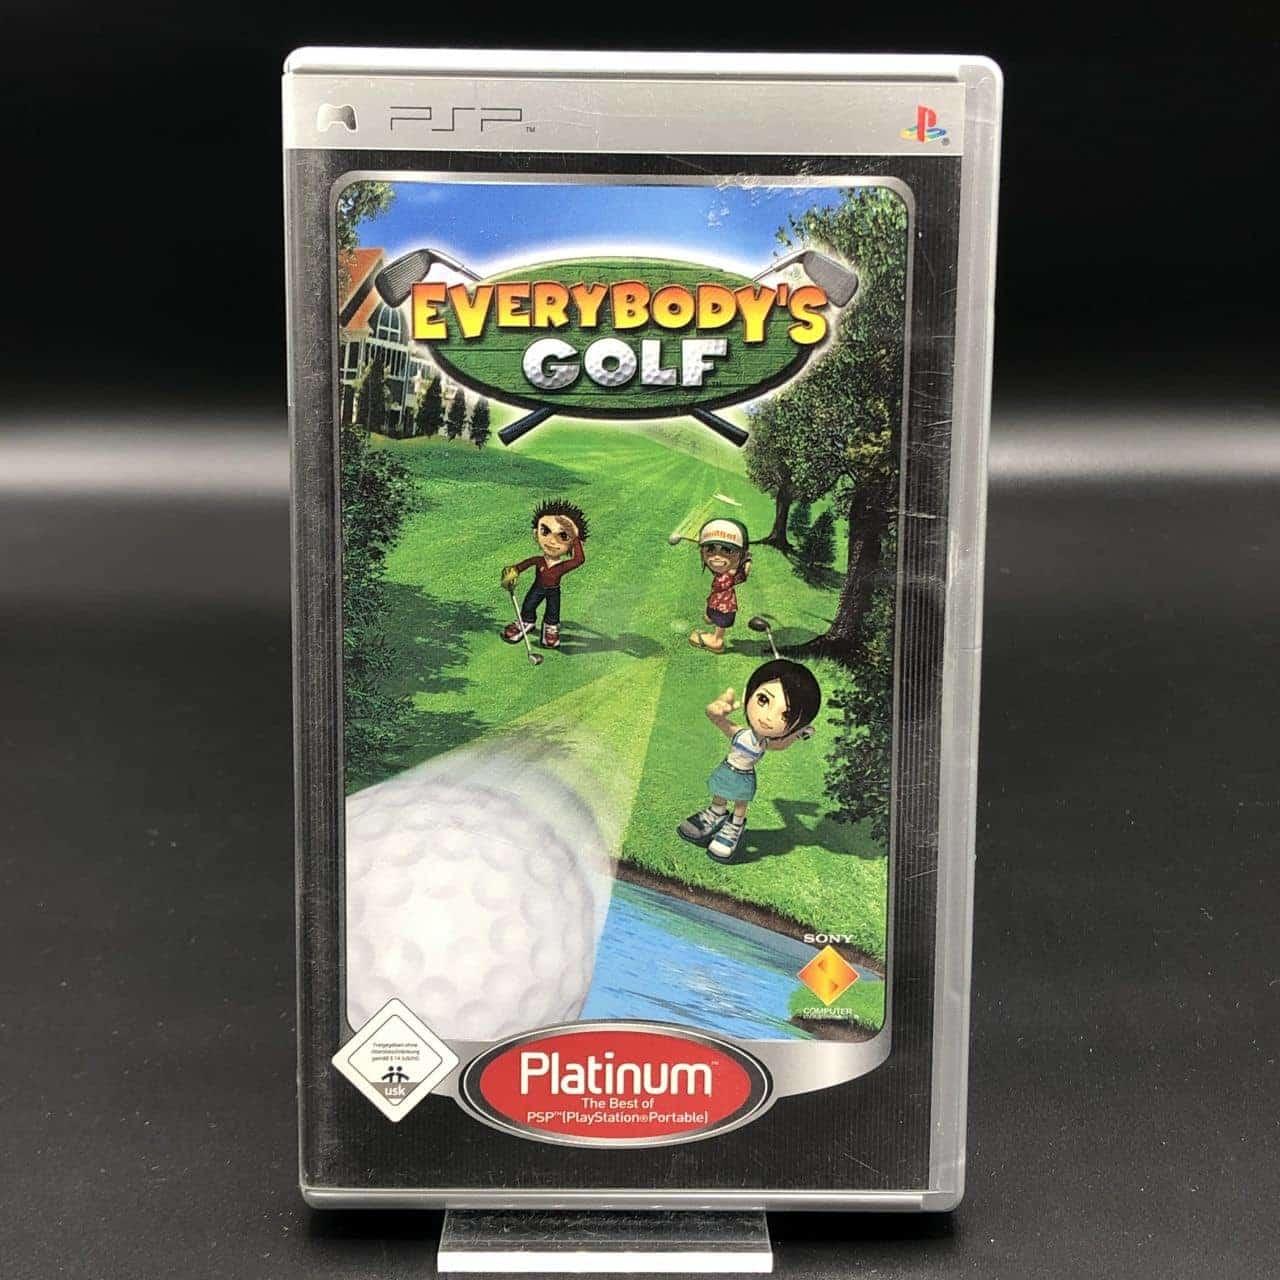 PSP Everybody's Golf (Platinum) (Komplett) (Gut) Sony PlayStation Portable